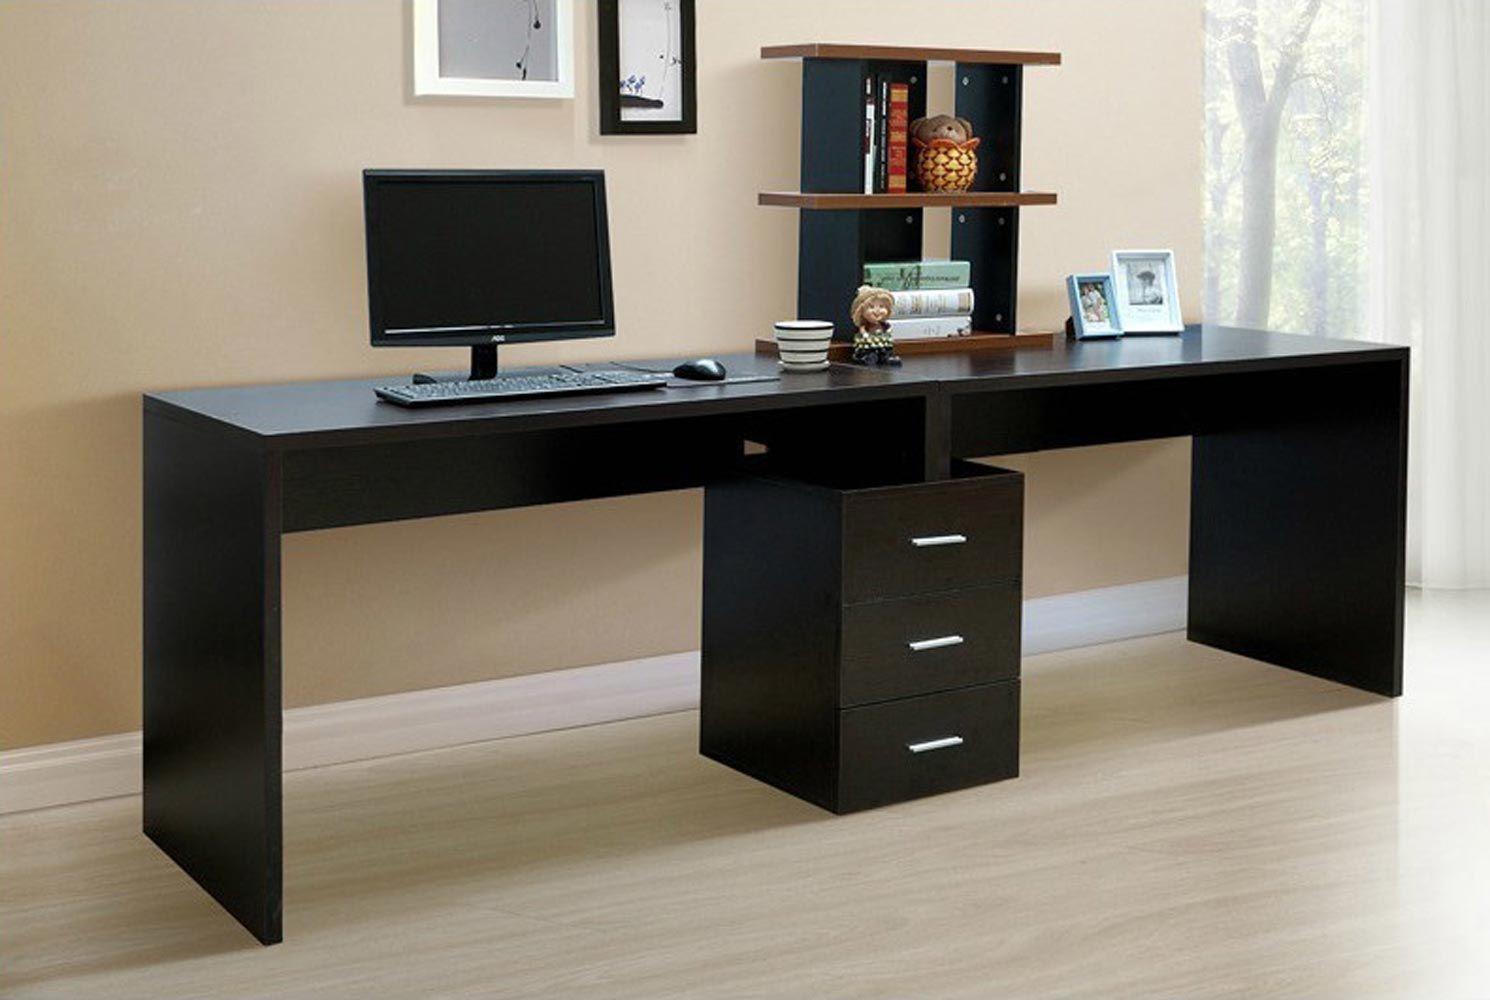 modern minimalist office computer. Black Minimalist Modern Desktop Computer Desk Table Office